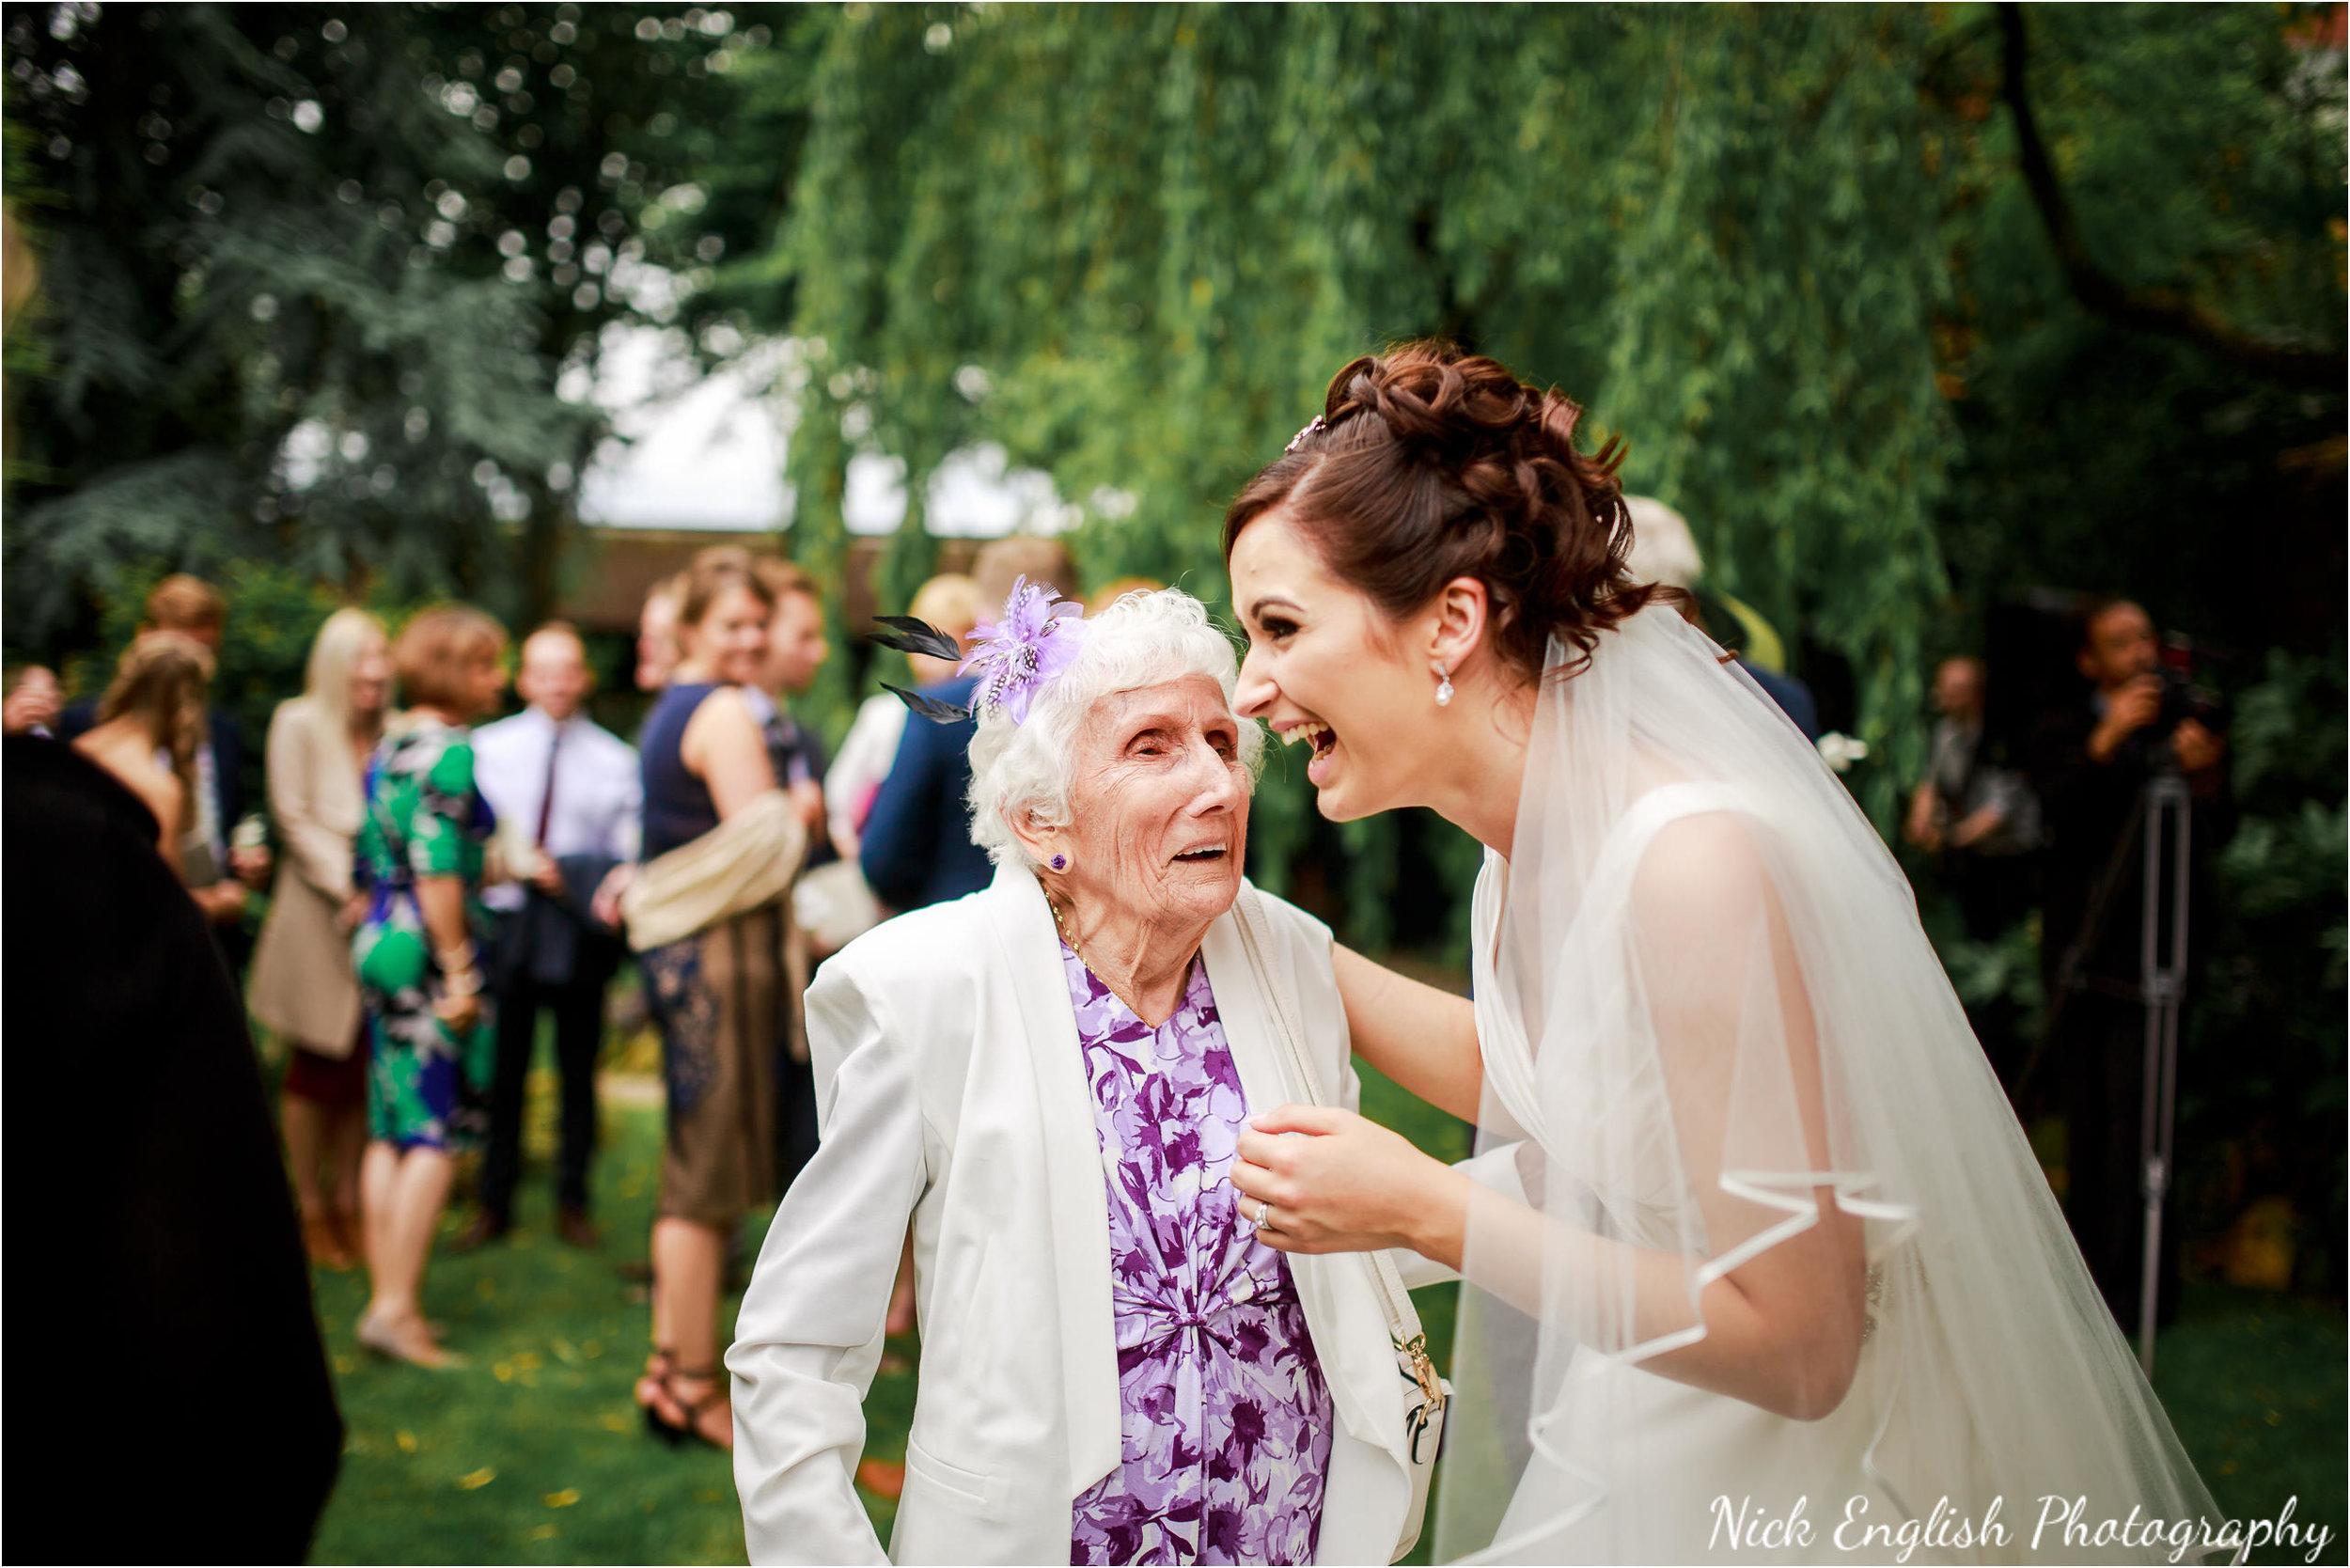 Emily David Wedding Photographs at Barton Grange Preston by Nick English Photography 129jpg.jpeg